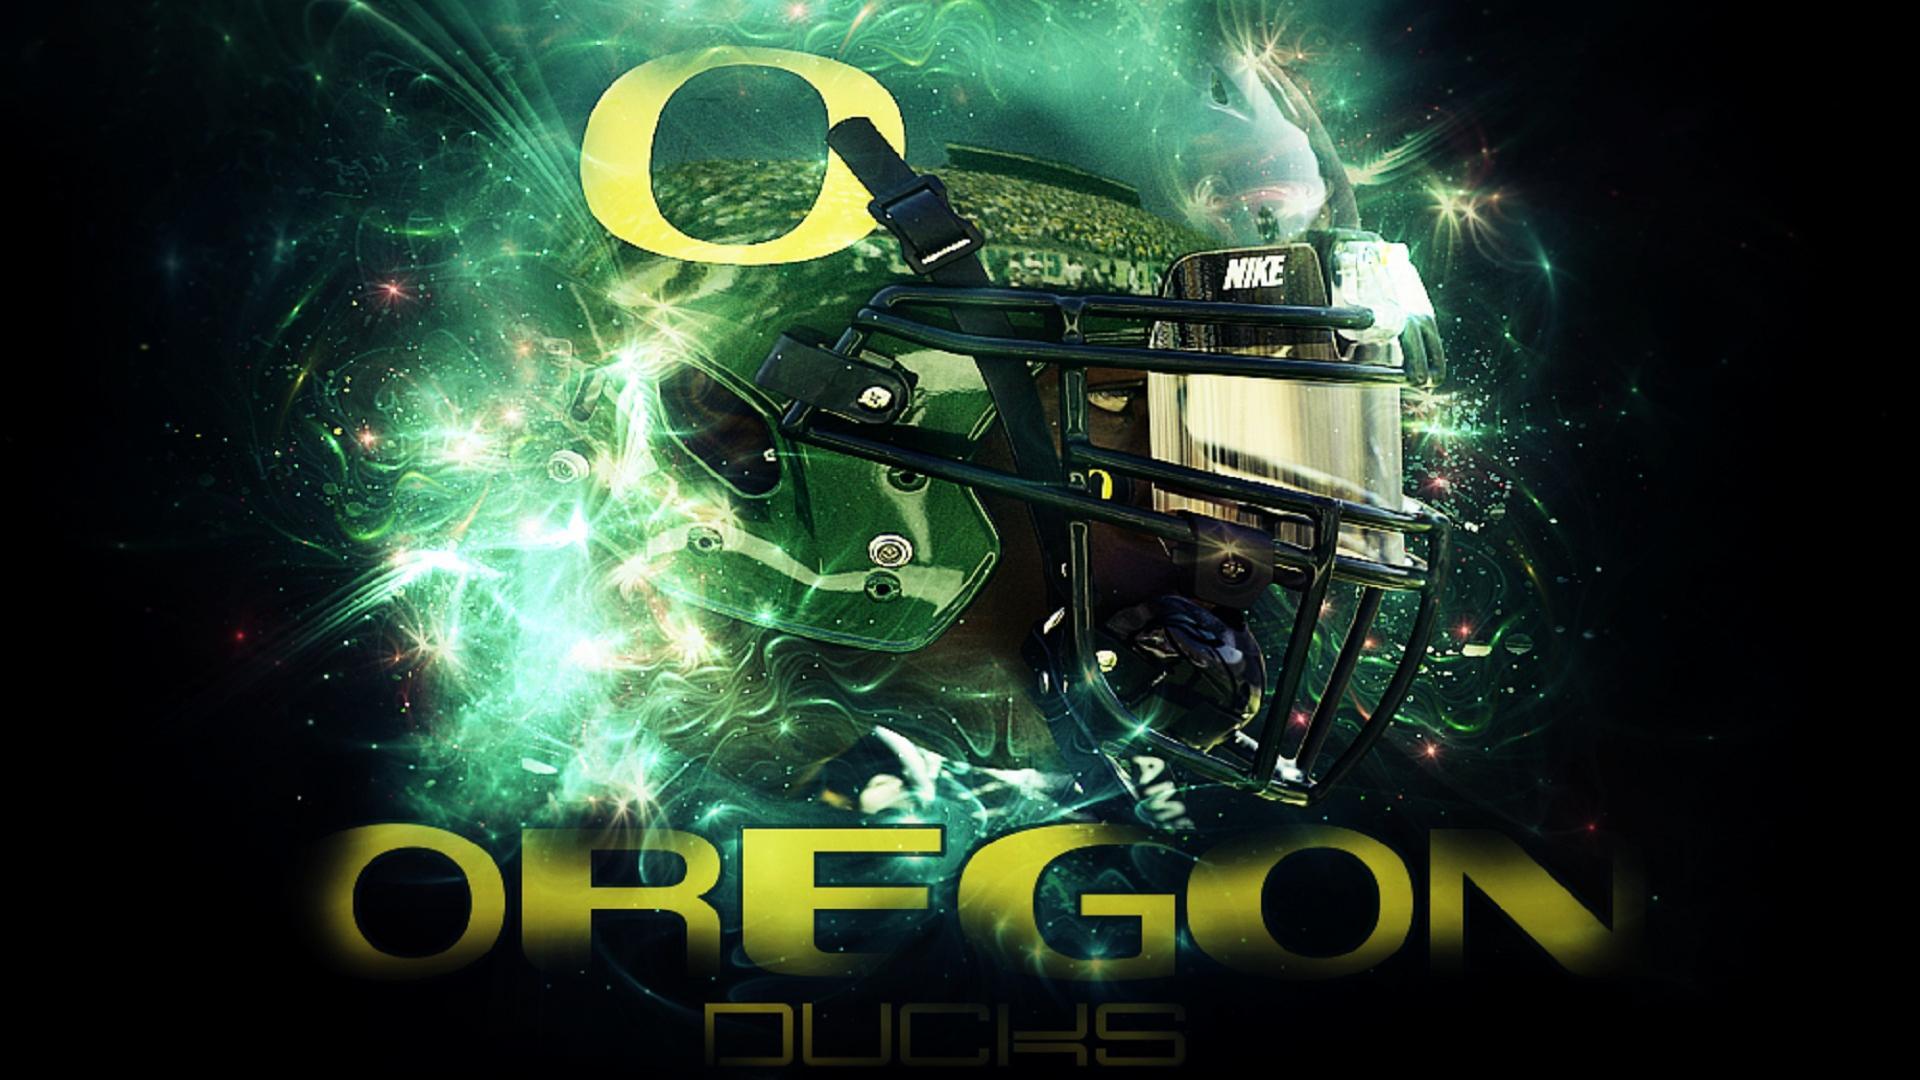 Hd Oregon Ducks Wallpaper Oregon Wallpapers And Desktop Backgrounds Up To 8k